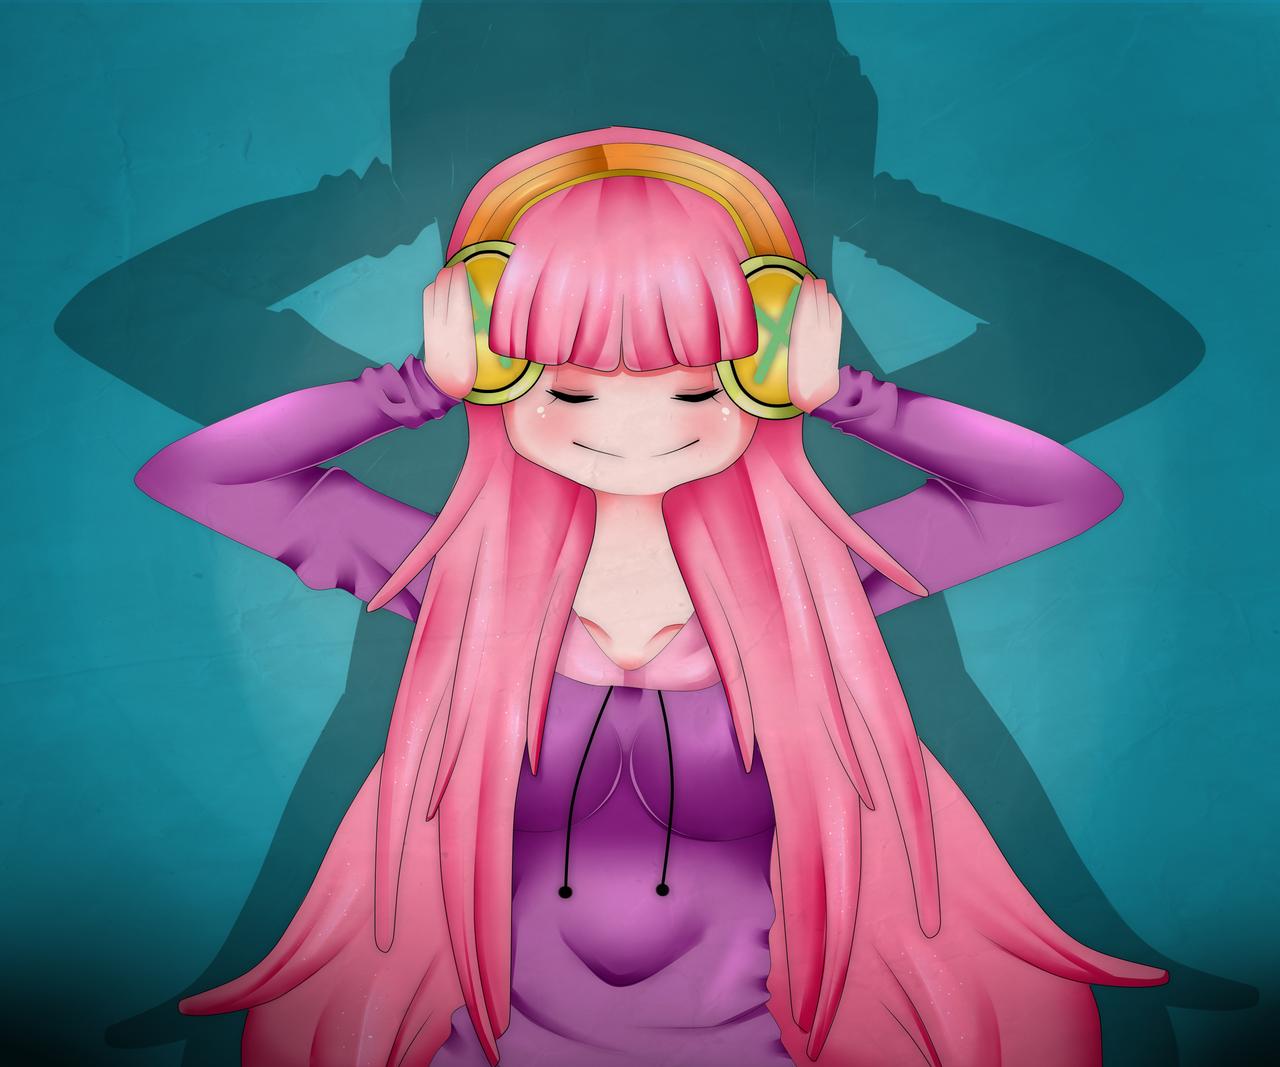 Bubblegum Princess by MichiSanIkaseko